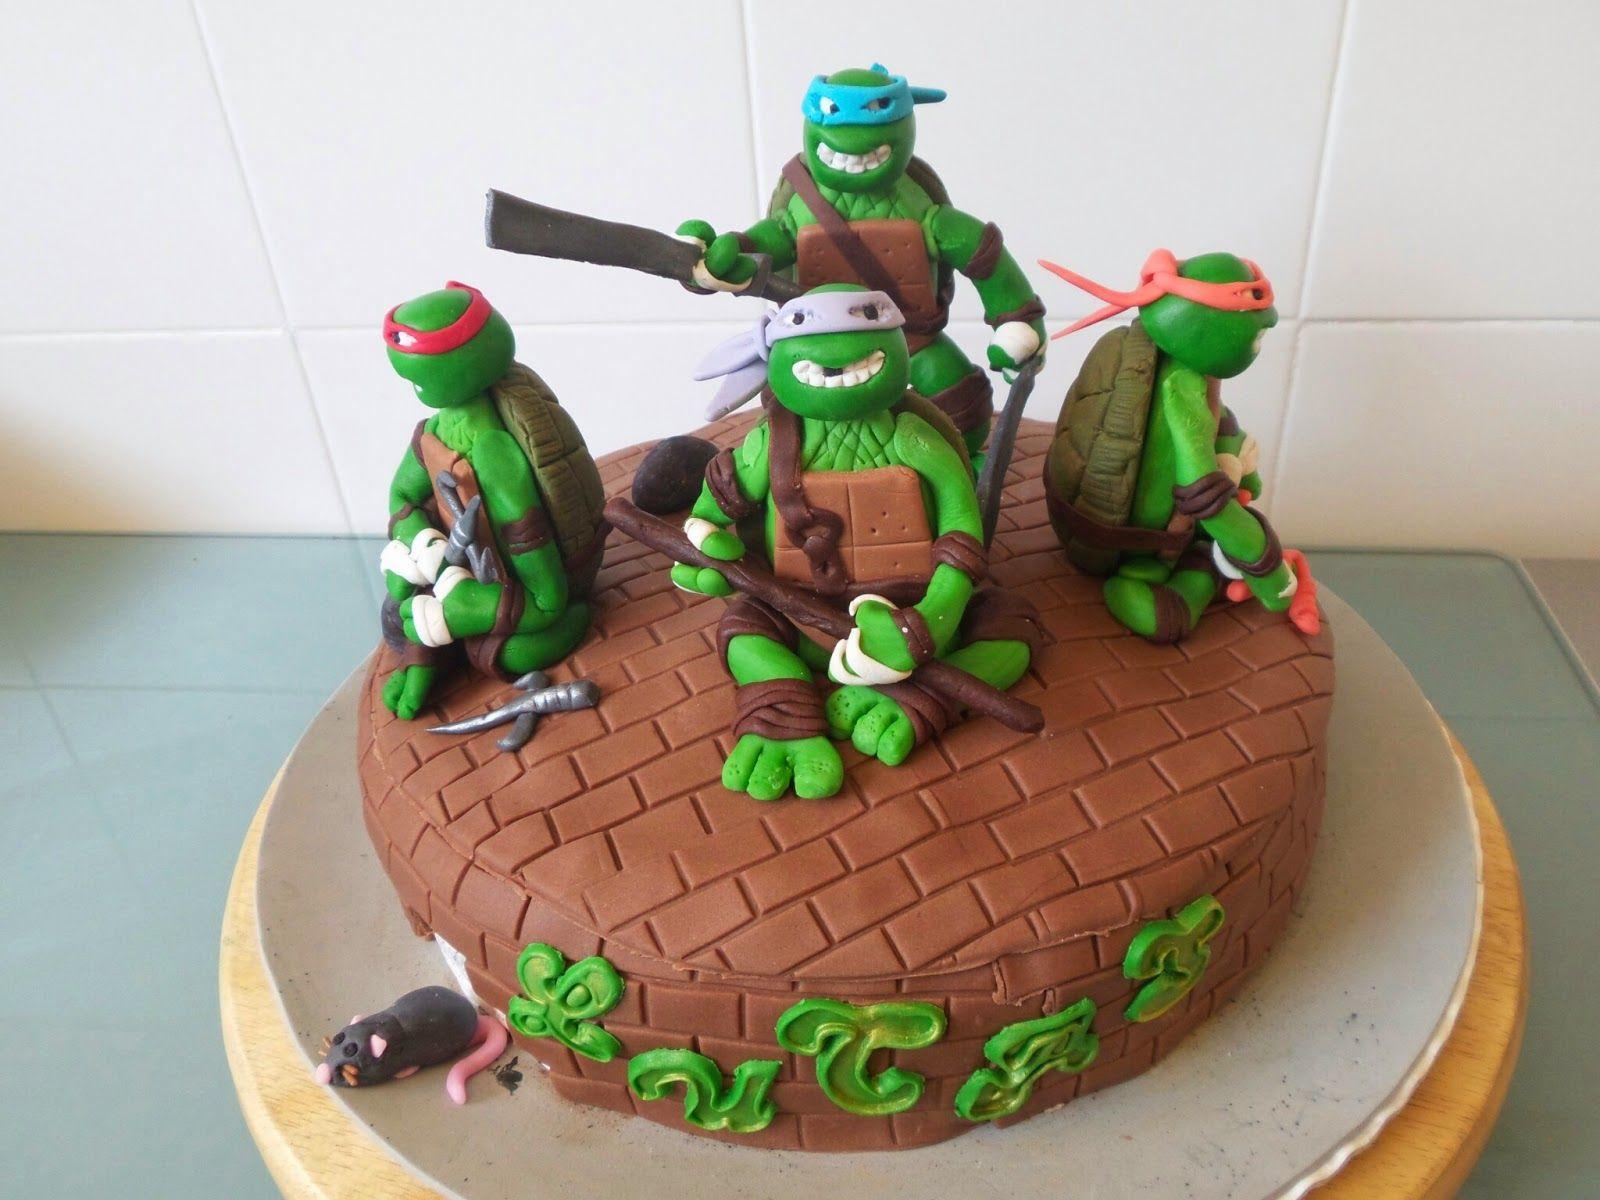 Inspirant Image à Imprimer tortue Ninja